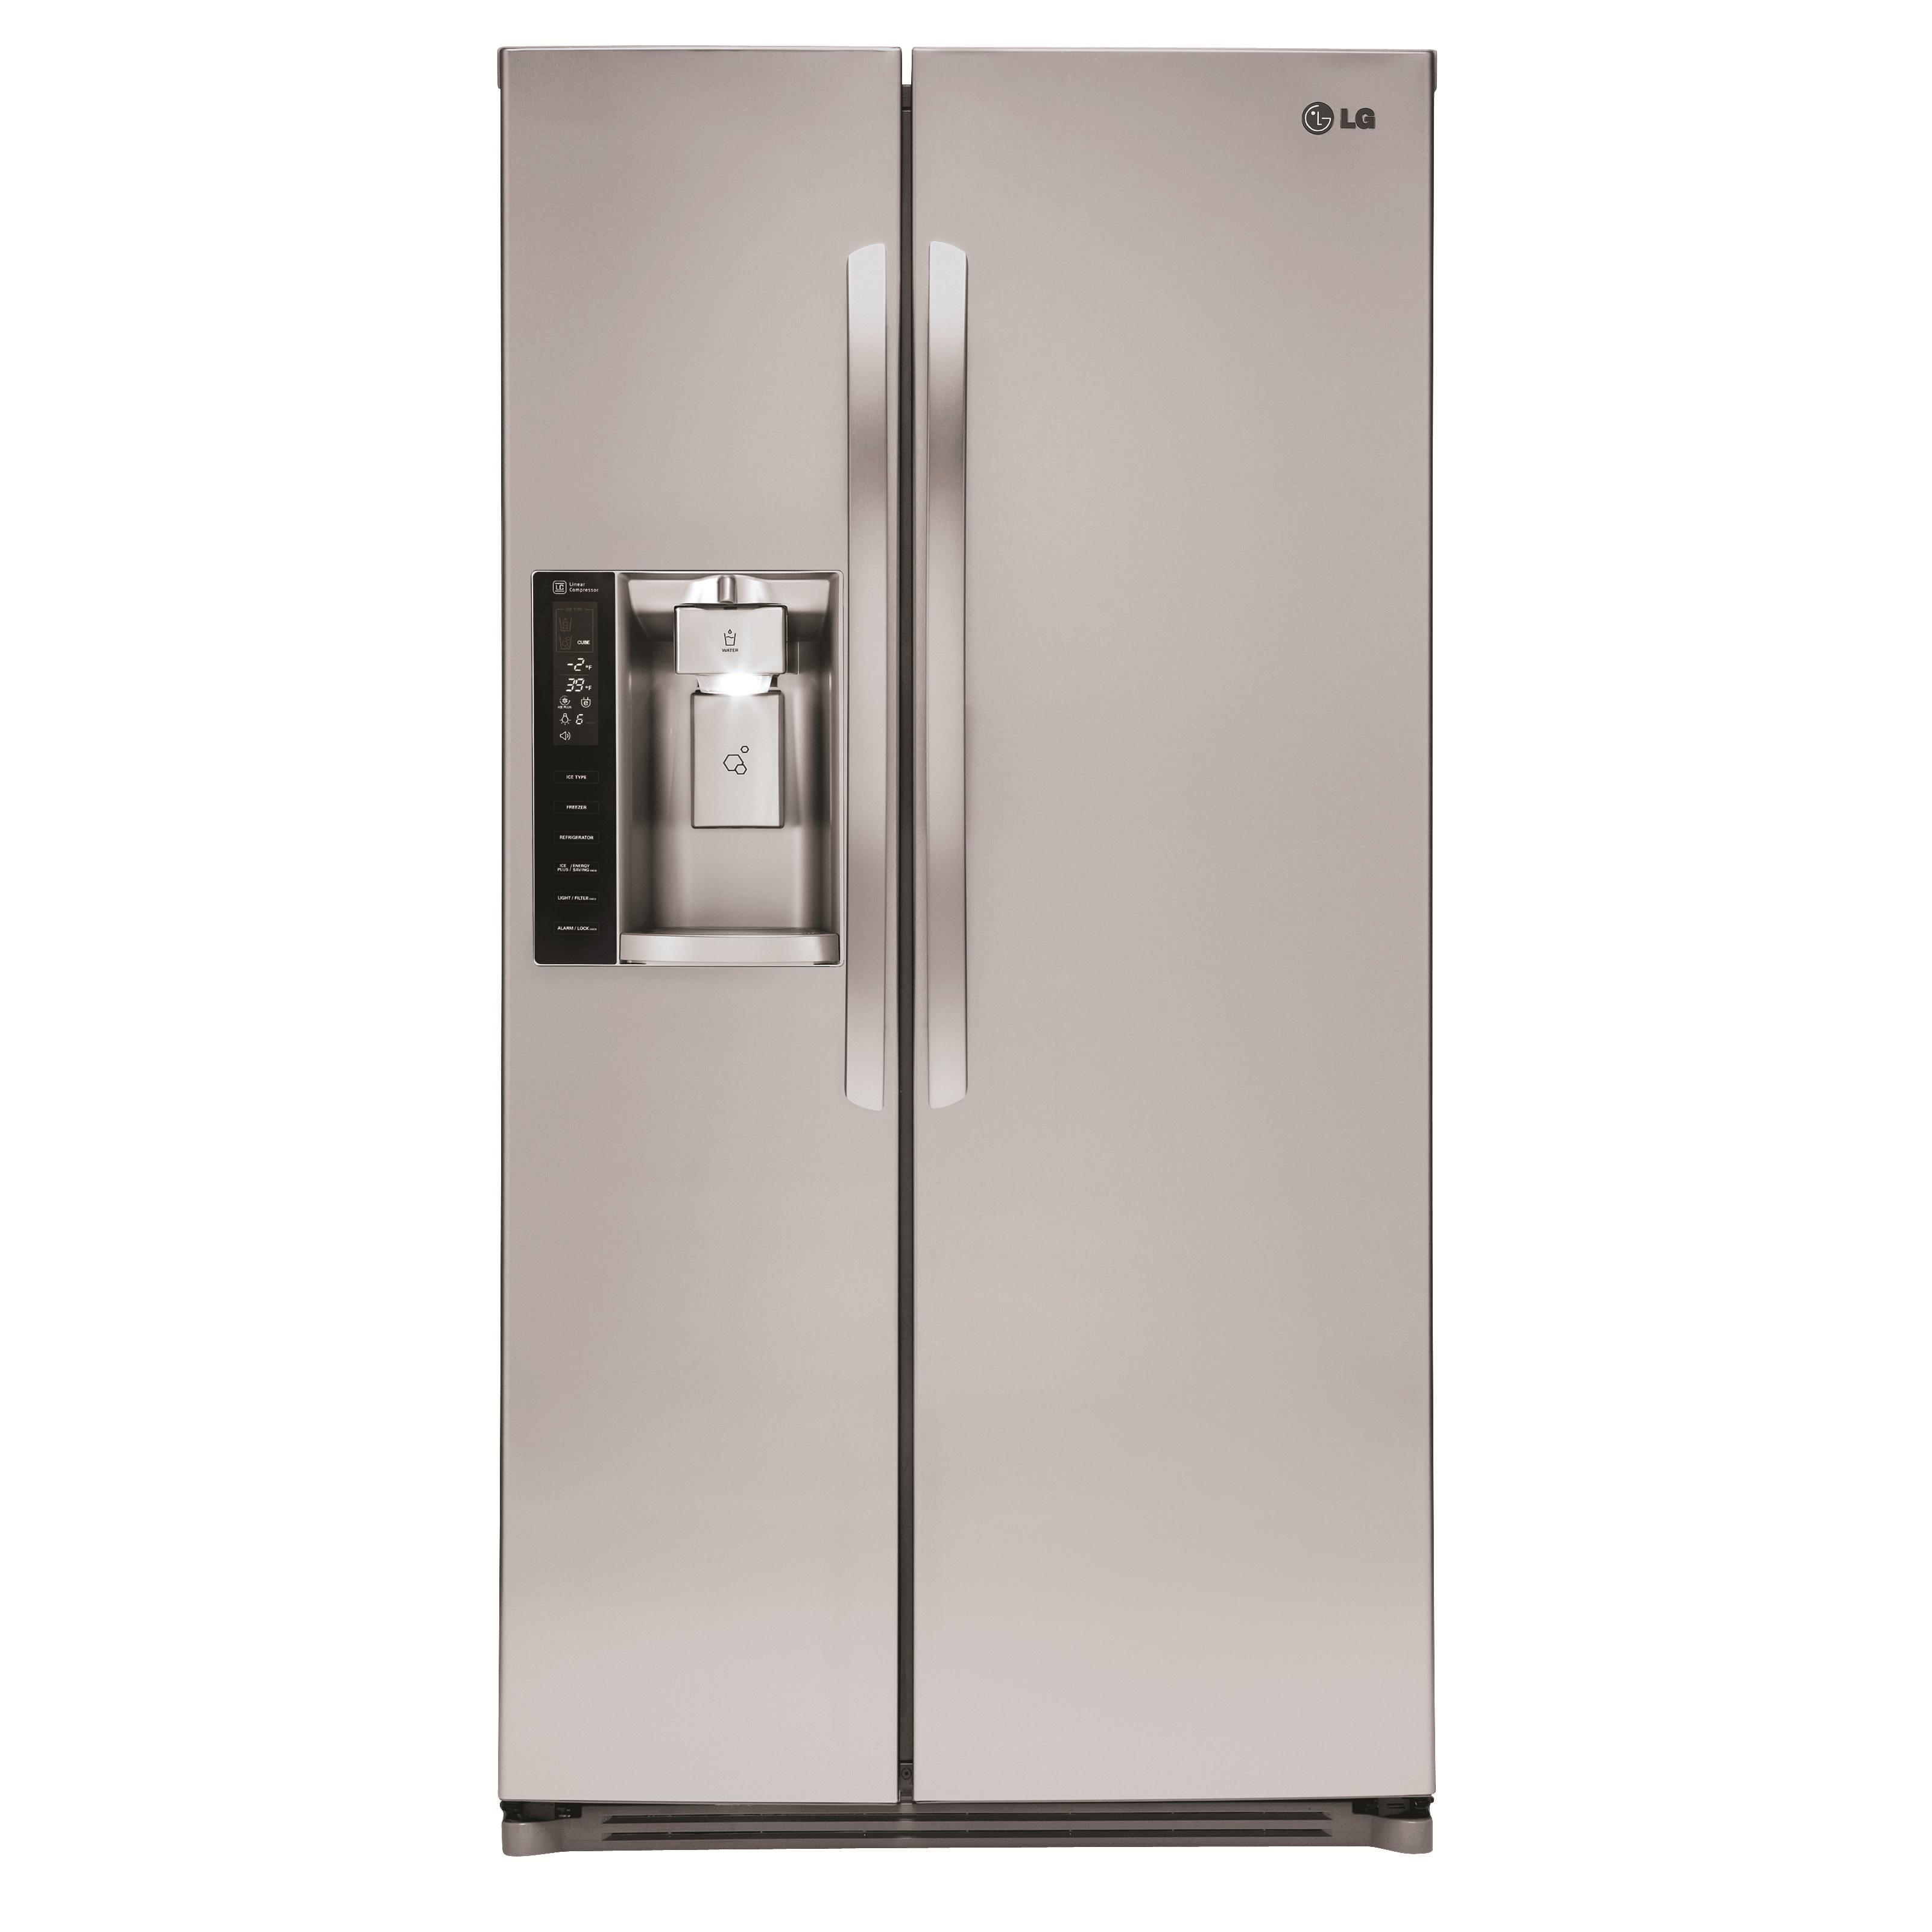 LG Appliances Side by Side Refrigerators 26 cu. ft. Side by Side Refrigerator - Item Number: LSXS26326S